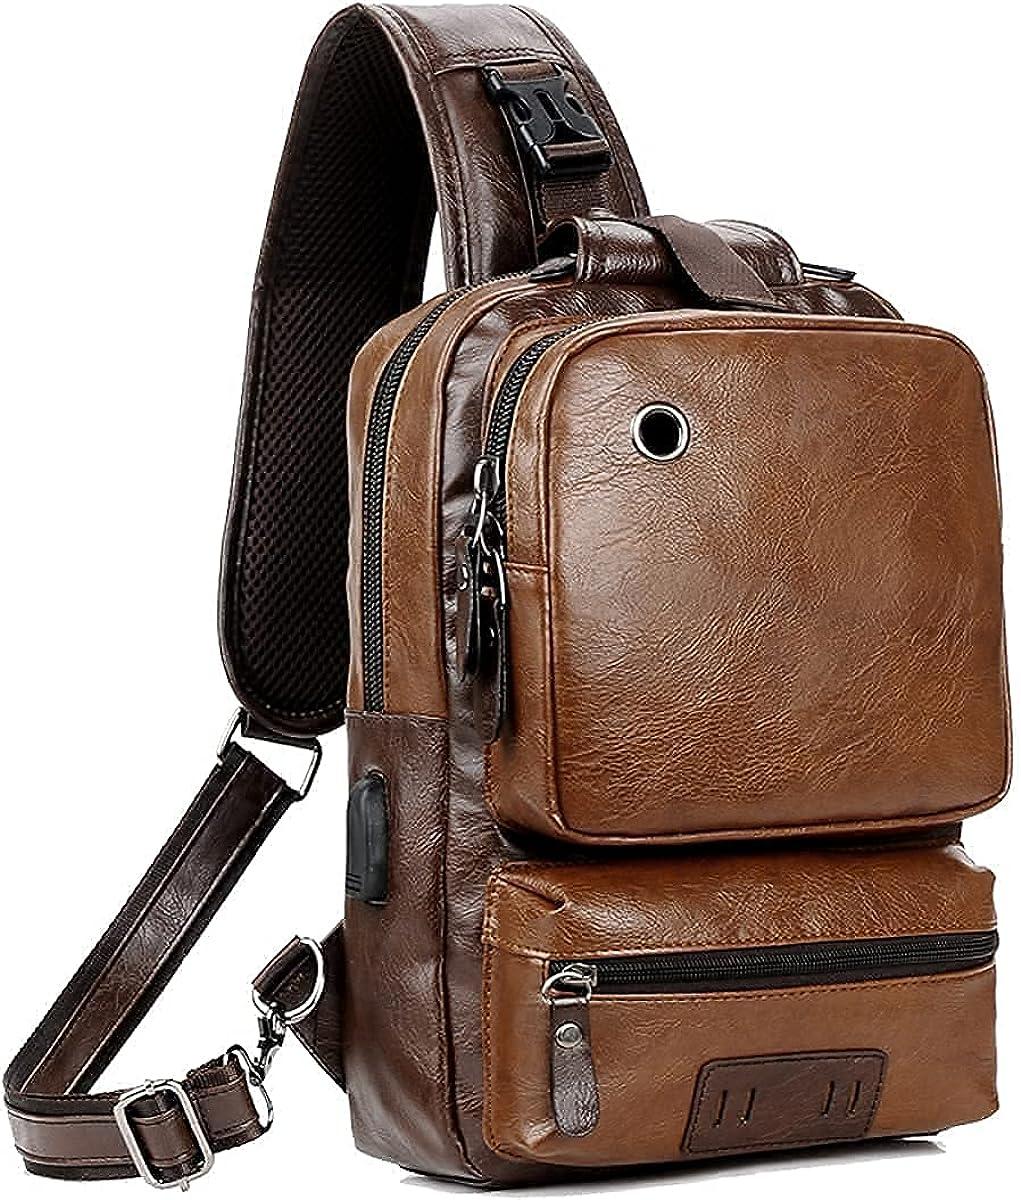 Small Black Sling Crossbody Backpack Shoulder Bag for Men Women Vintage PU Leather Sling Backpack Cycling USB Charger